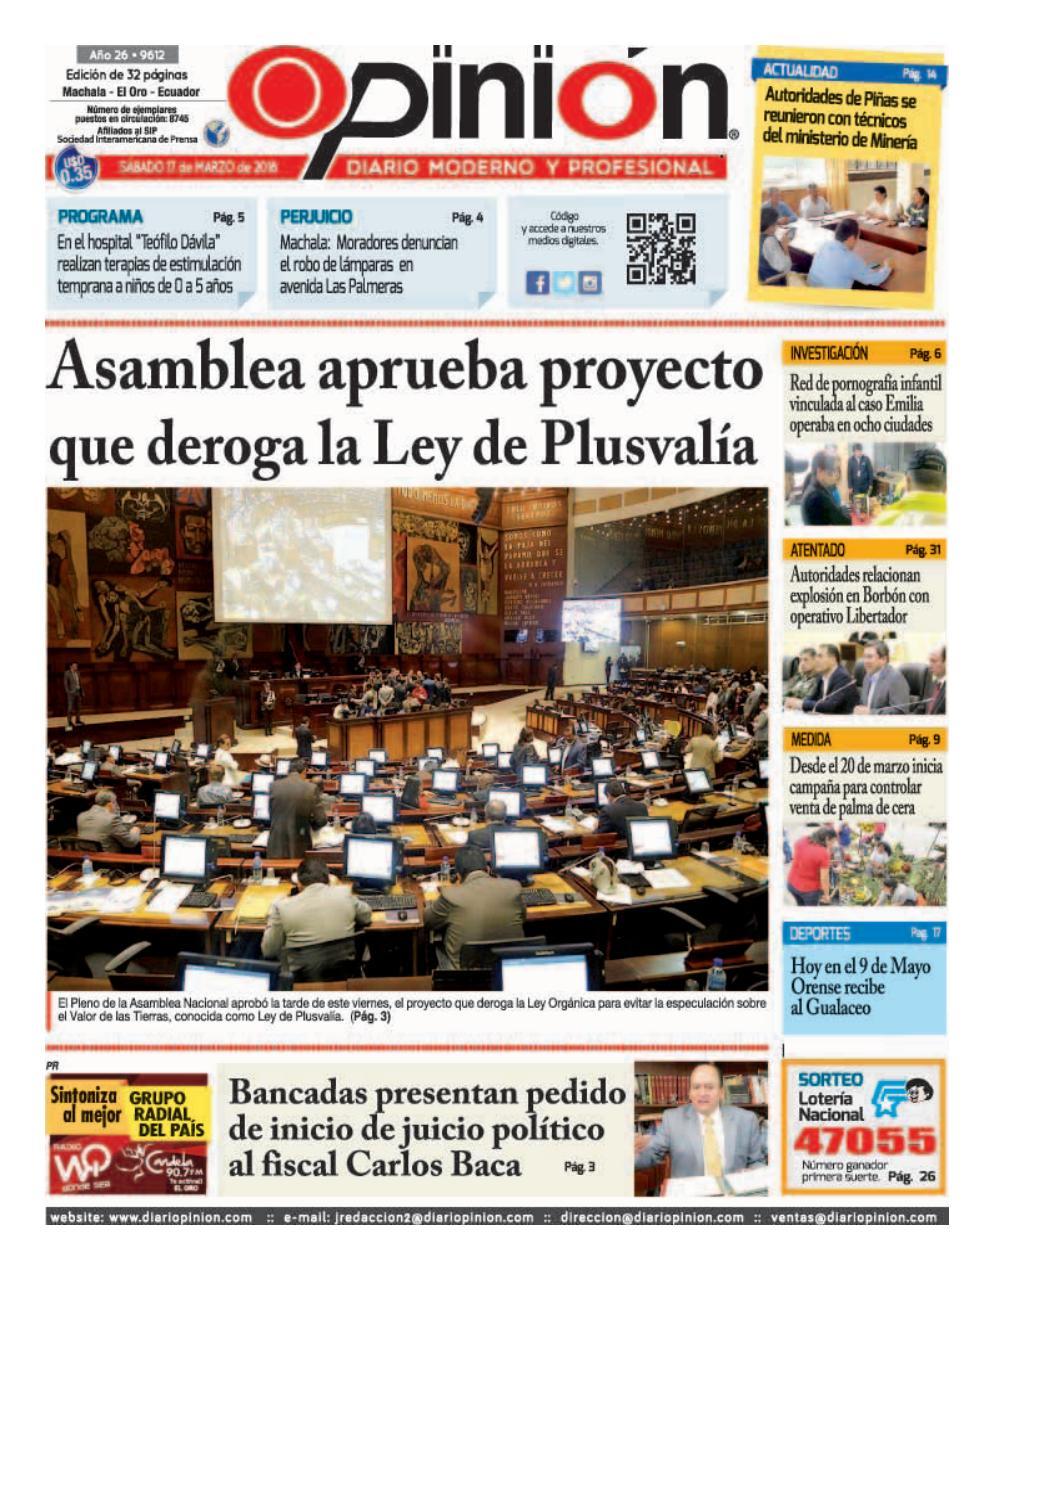 Impreso 17 03 18 by Diario Opinion - issuu c02e1d8d29f8